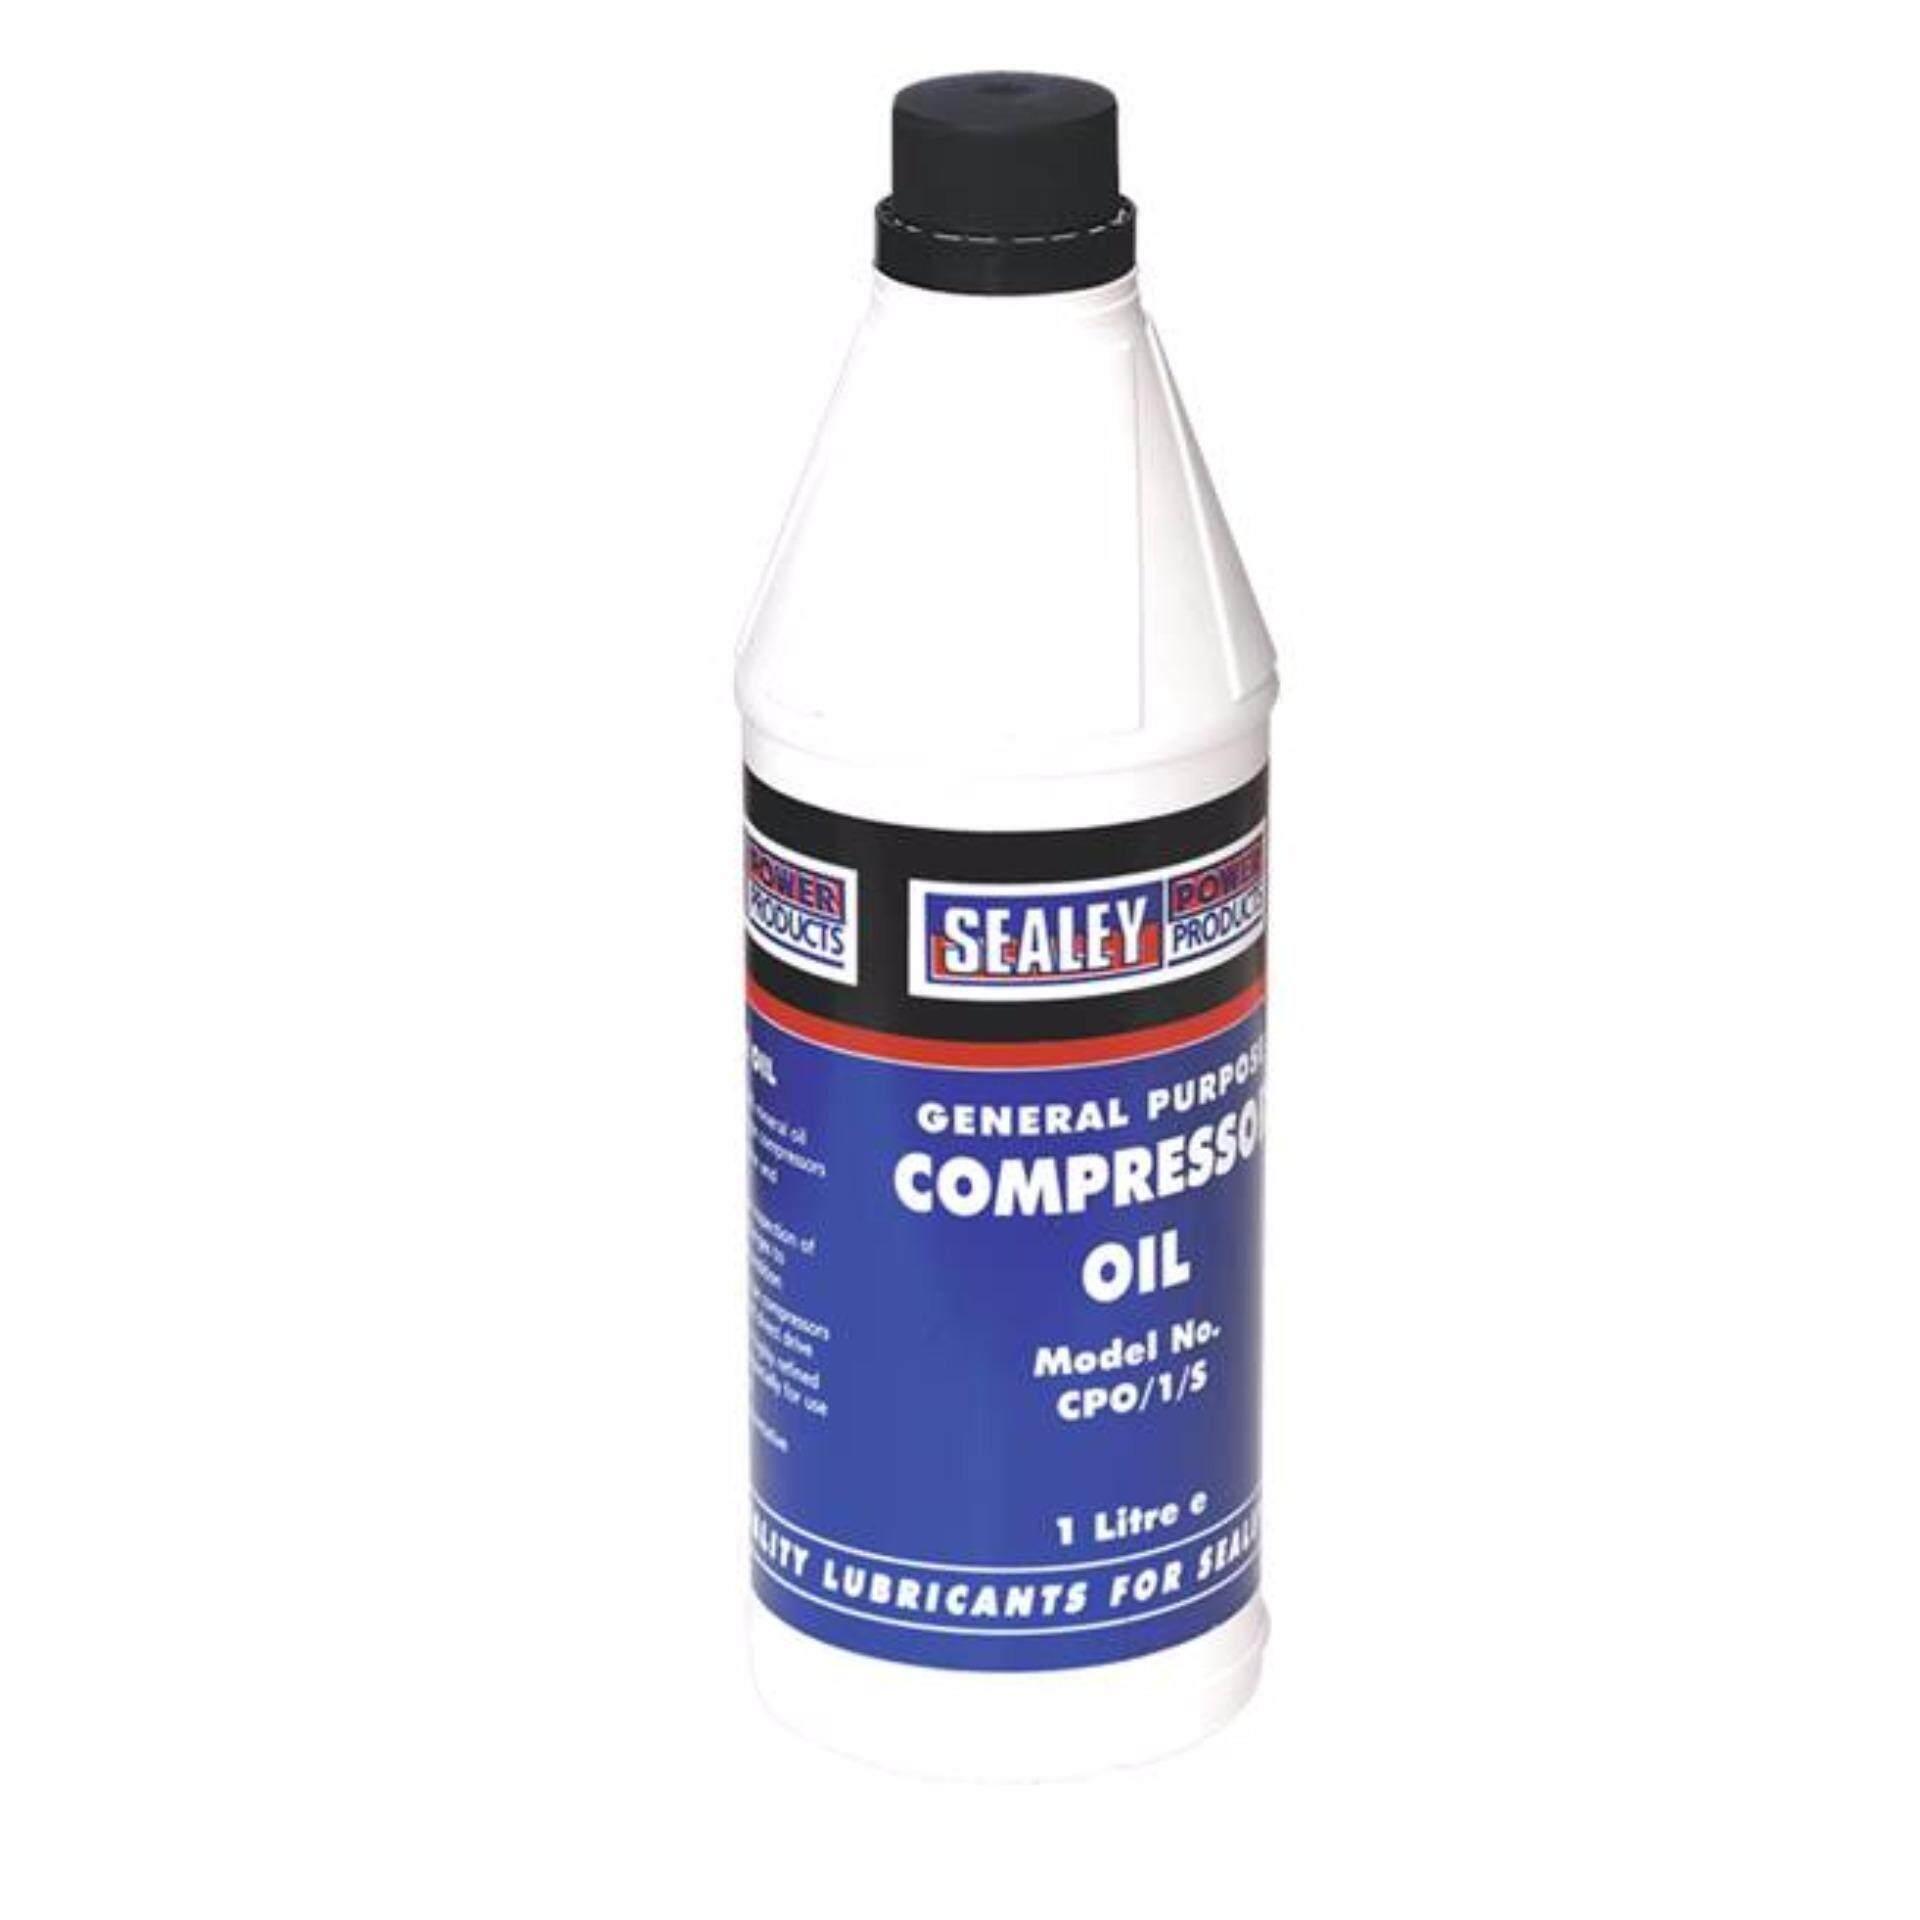 Sealey Compressor Oil 1LTR